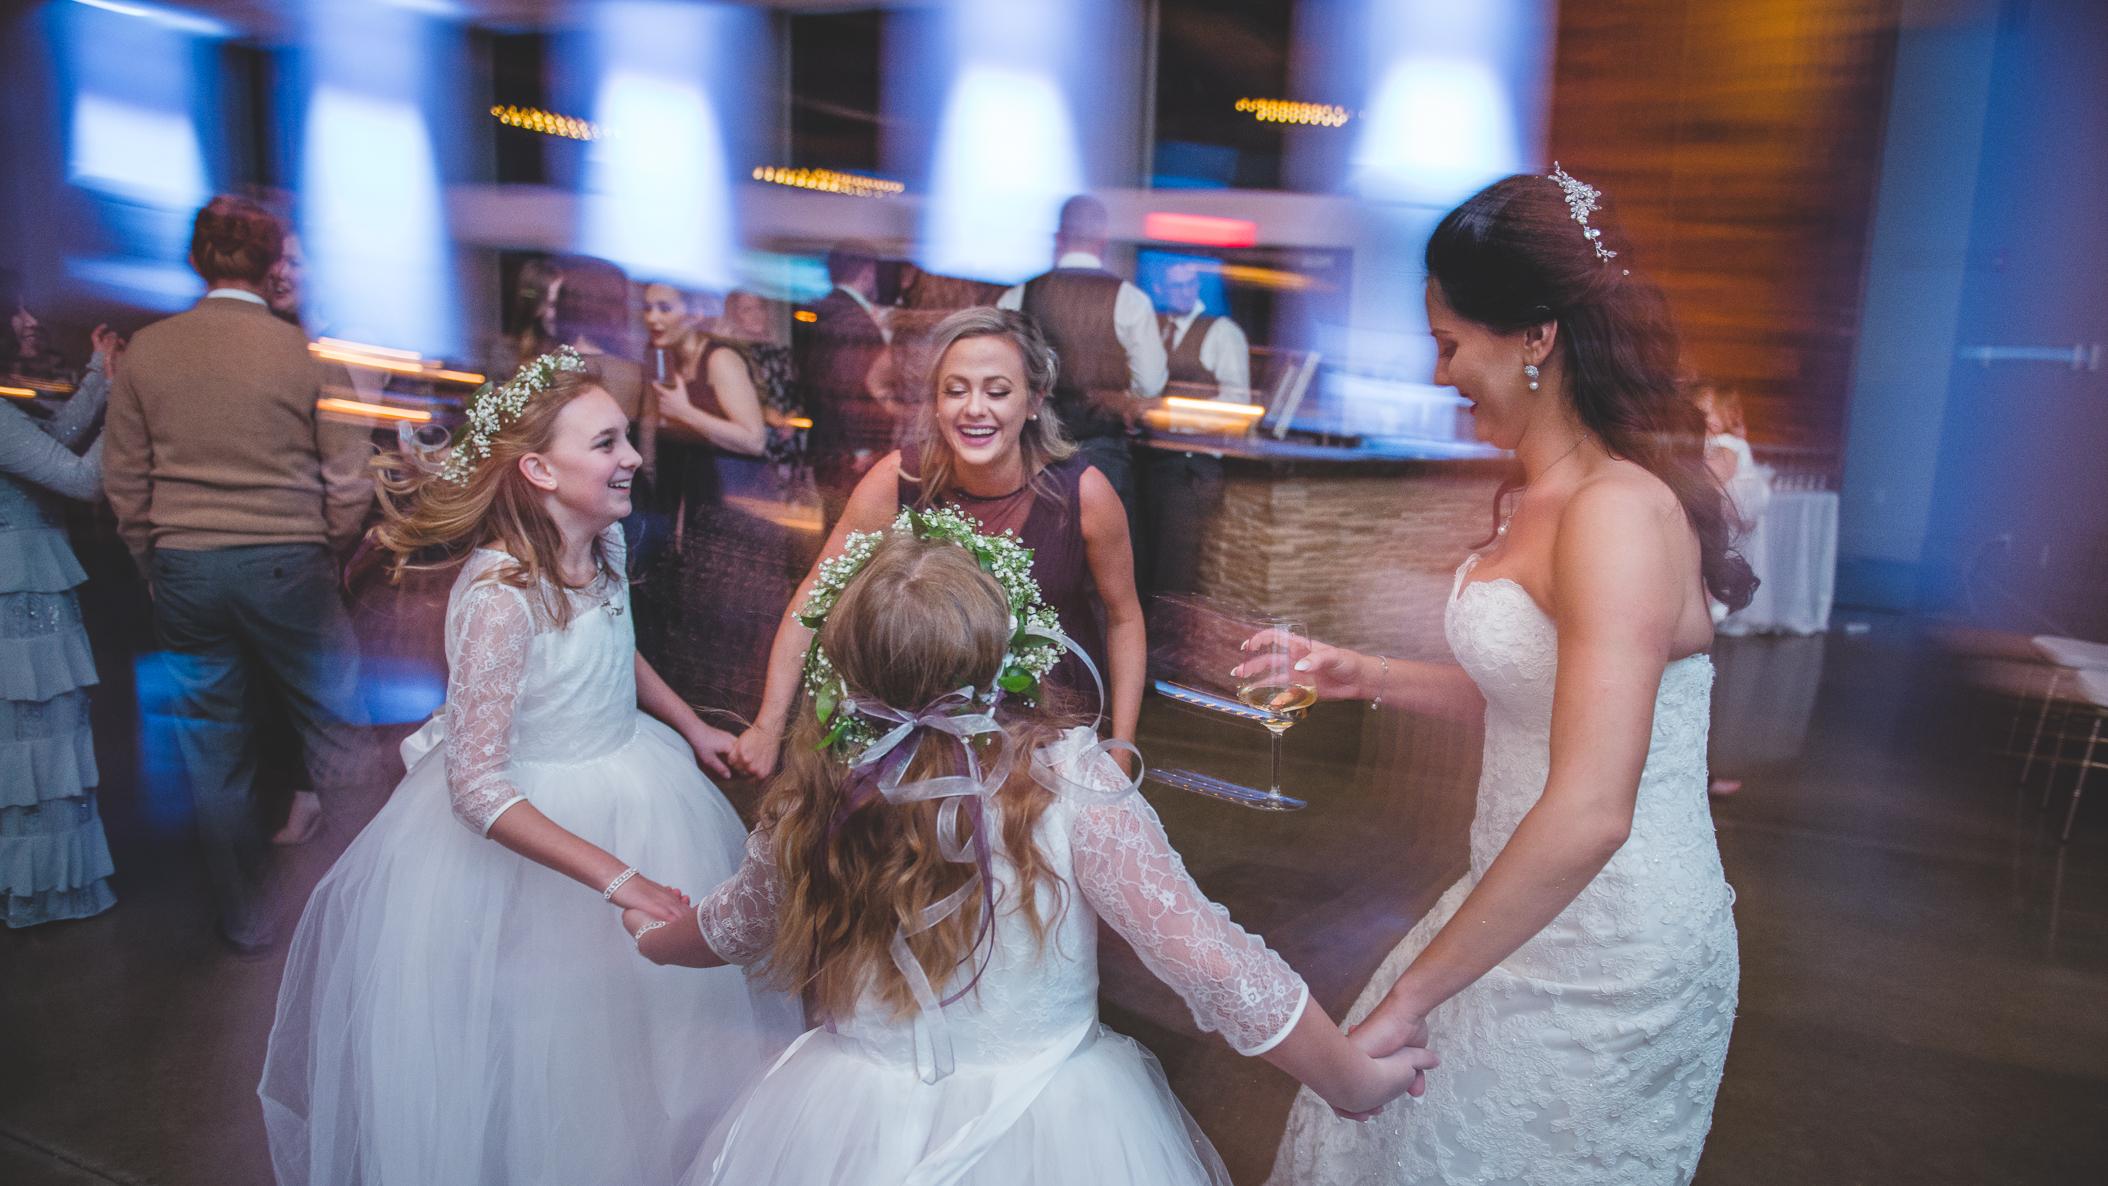 Grace & Ben Wedding Preview - Dustin Morrison Photography-21.jpg